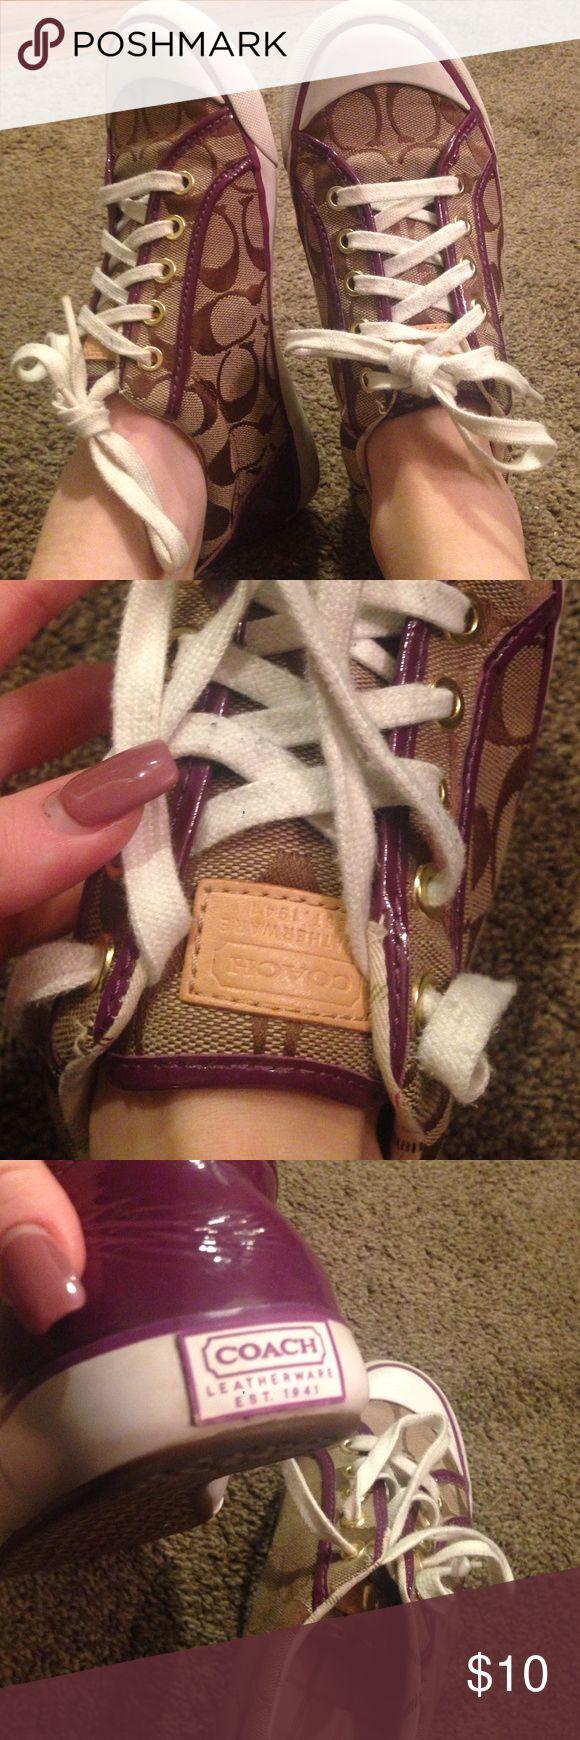 Purple coach tennis shoes size 7 Used- shows a little wear. authentic Coach tennis shoes Coach Shoes Sneakers